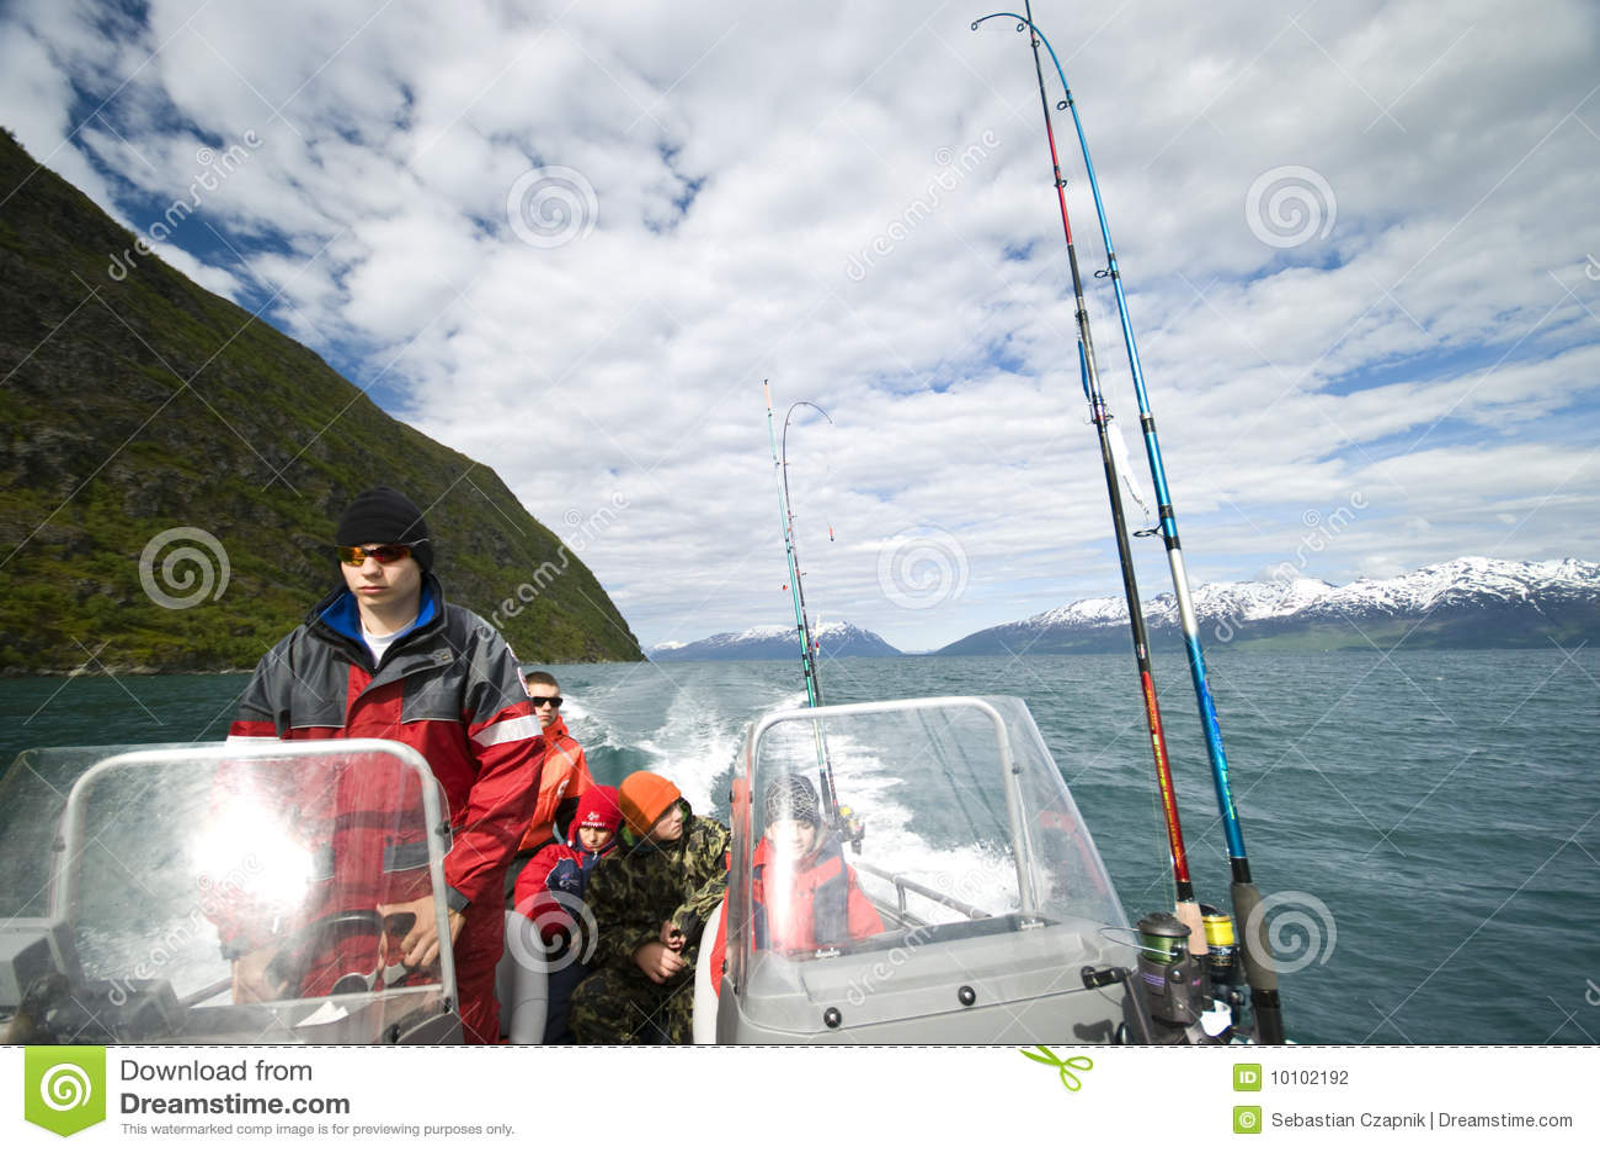 Boys in motorboat